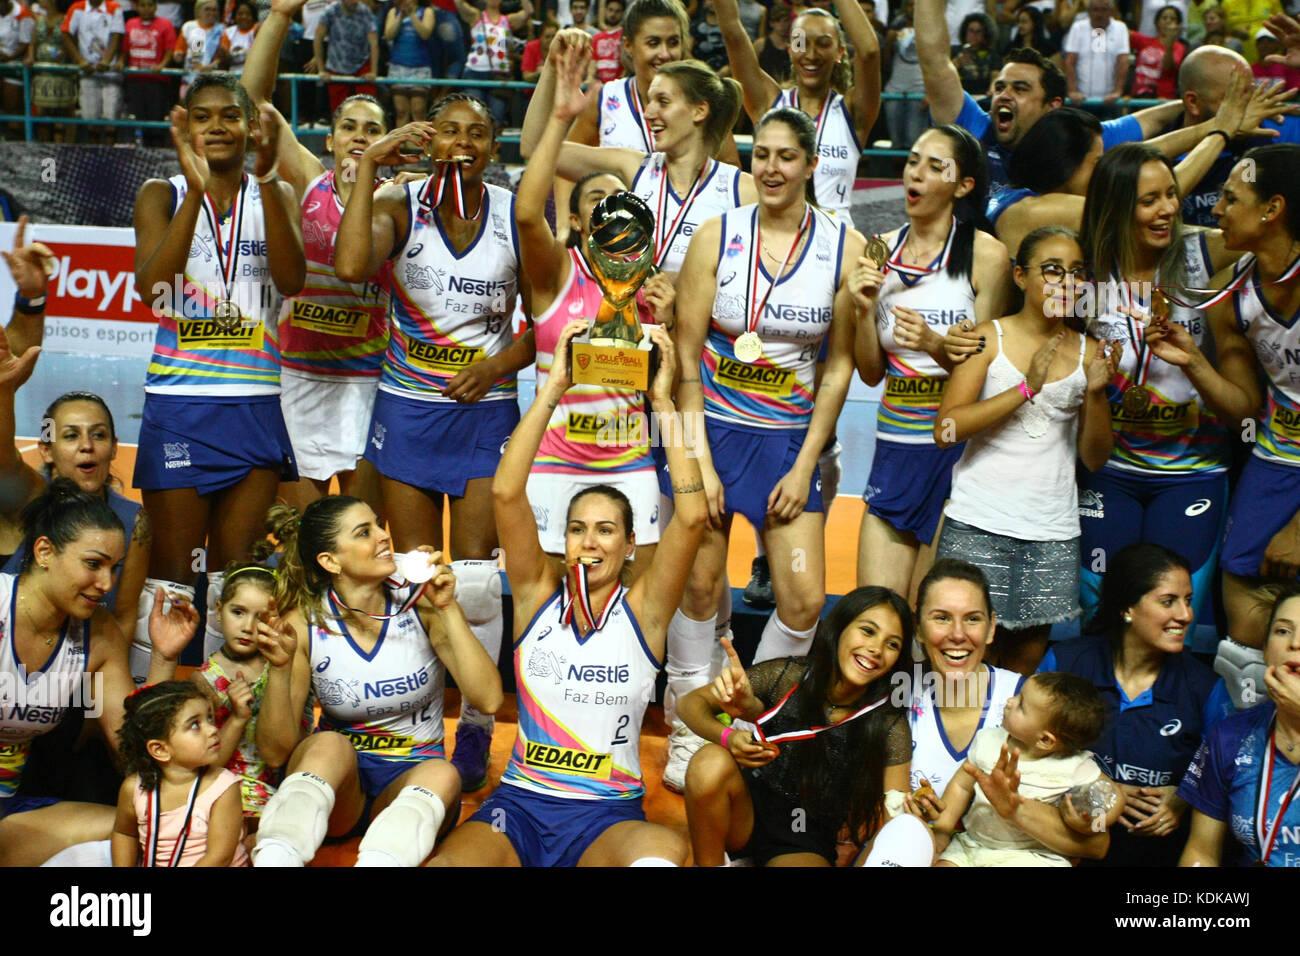 Osasco Brazil. 13th Oct 2017. Vôlei Nestlé's teamcof coach Stock Photo Royalty Free Image